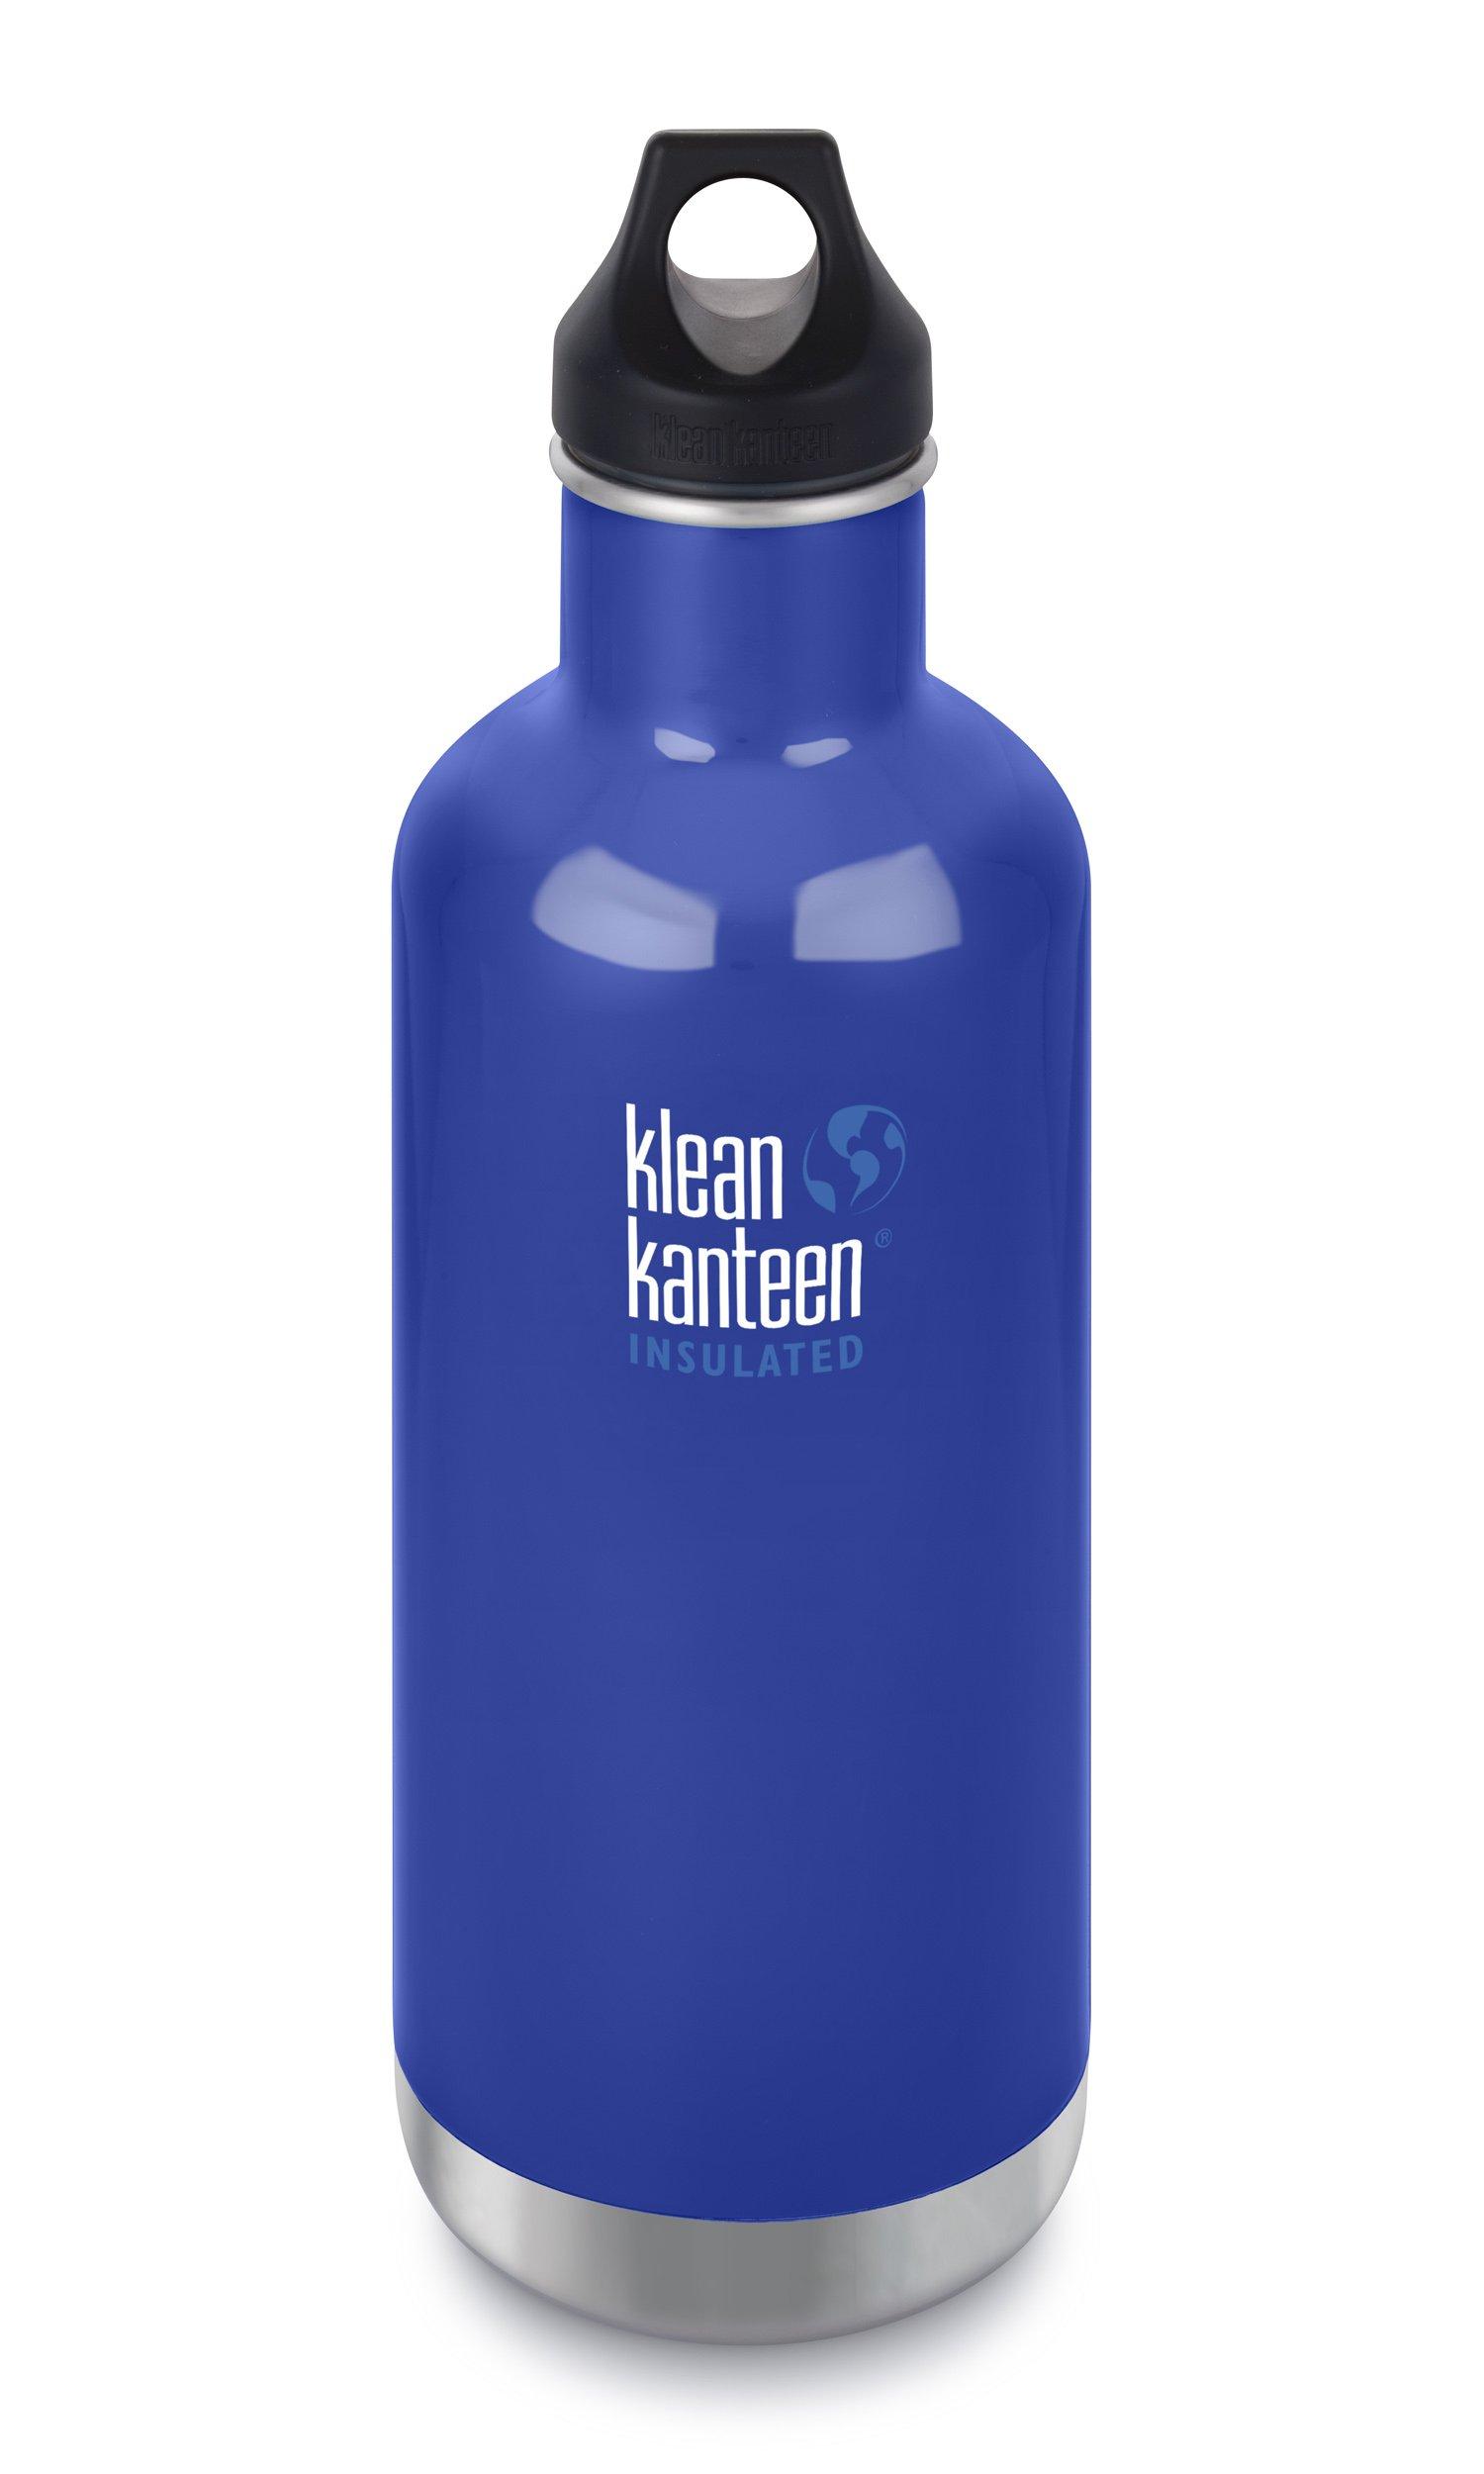 Klean Kanteen Classic Insulated Stainless Steel Water Bottle with Klean Coat and Leak Proof Loop Cap - 32oz - Coastal Waters